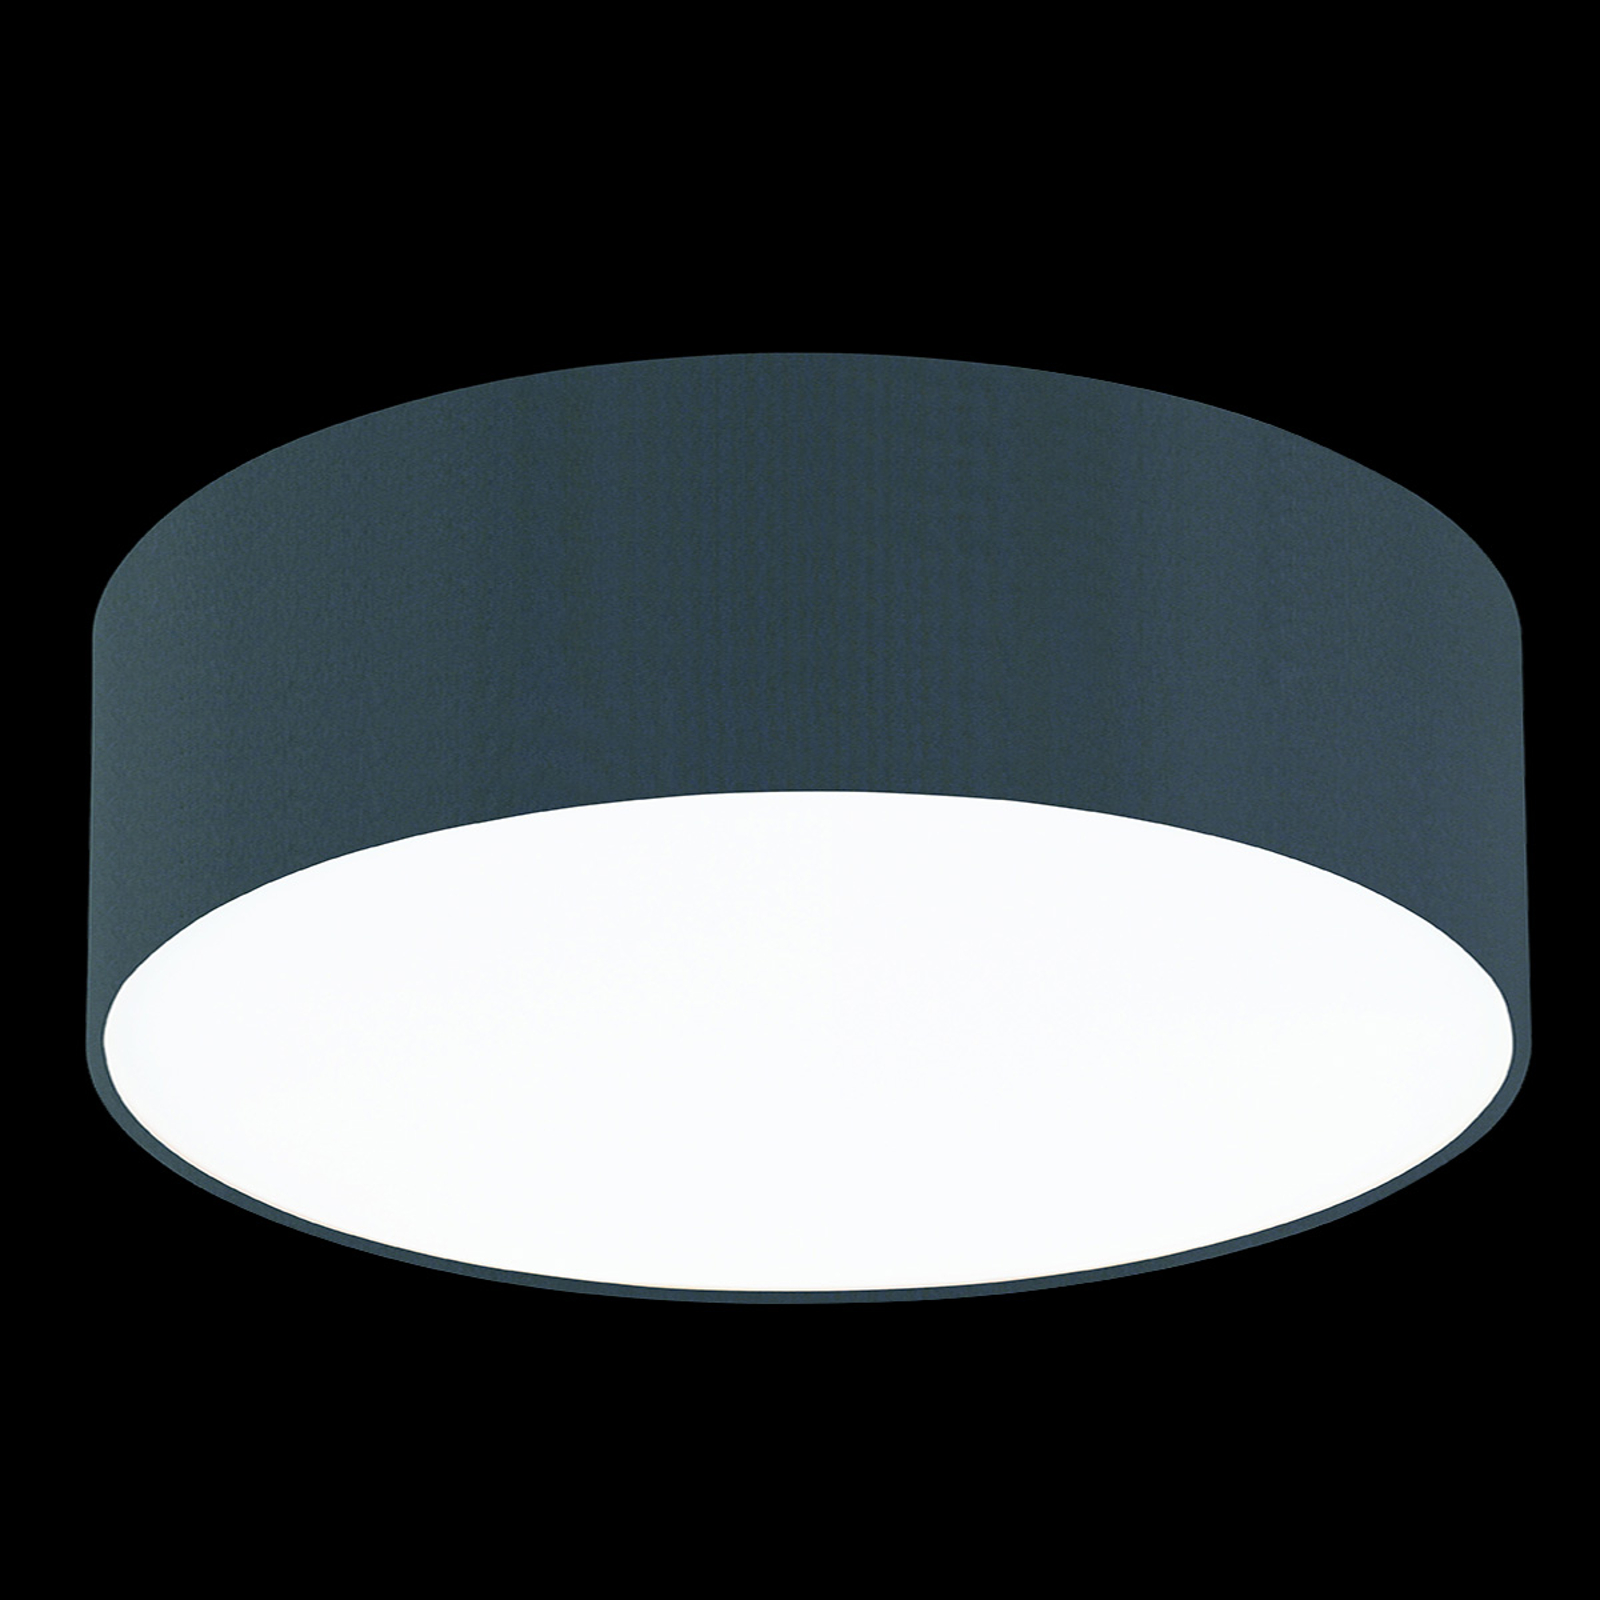 Lampa sufitowa MARA, 60 cm, szary łupek